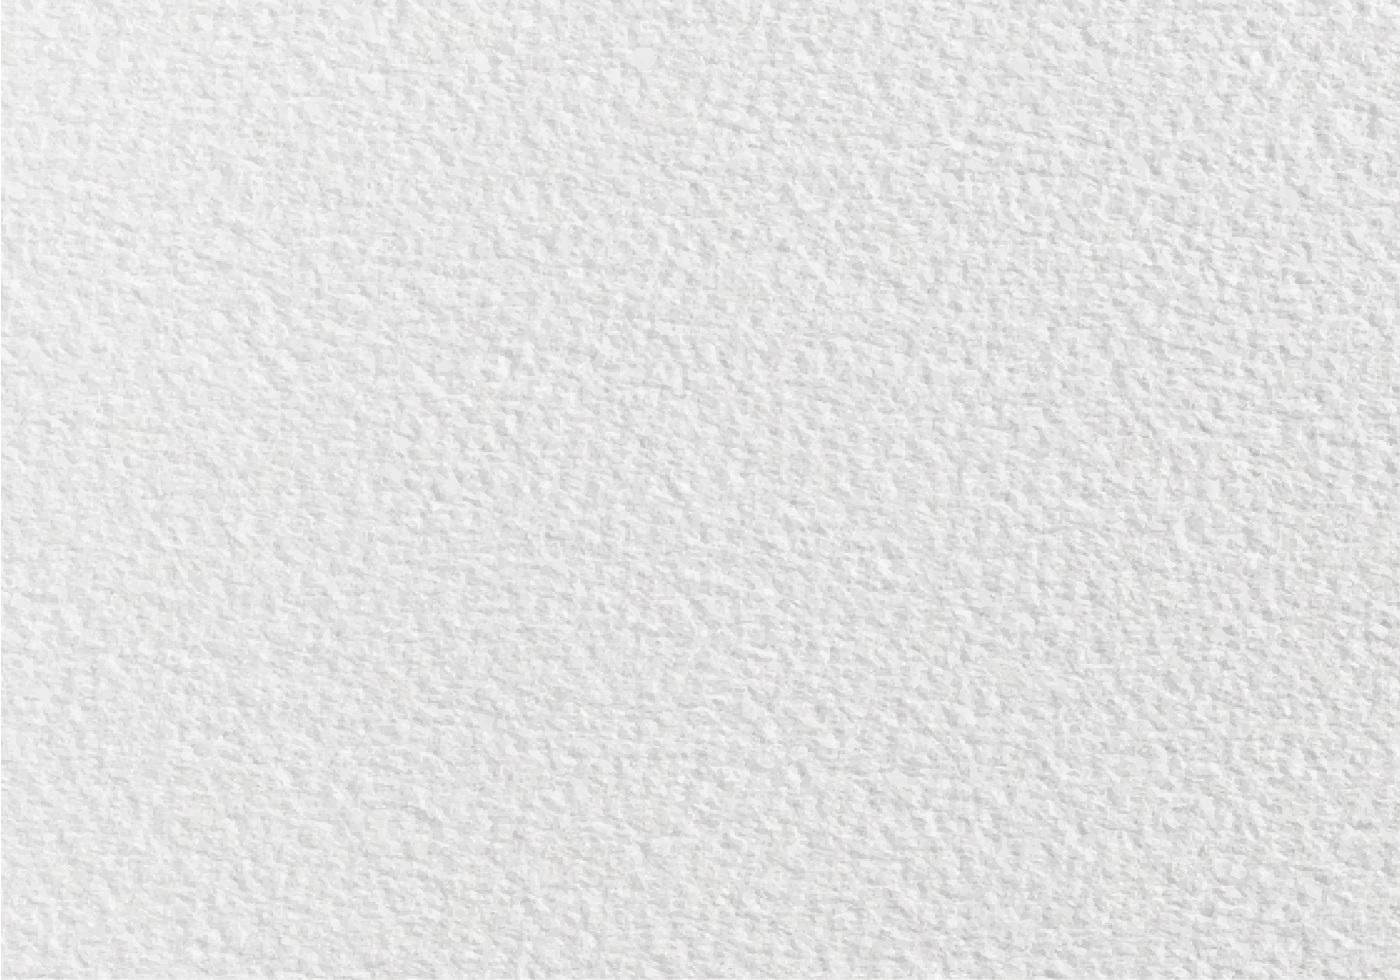 Free Vector Watercolor Paper Texture Tekstura Bumagi Tvorcheskie